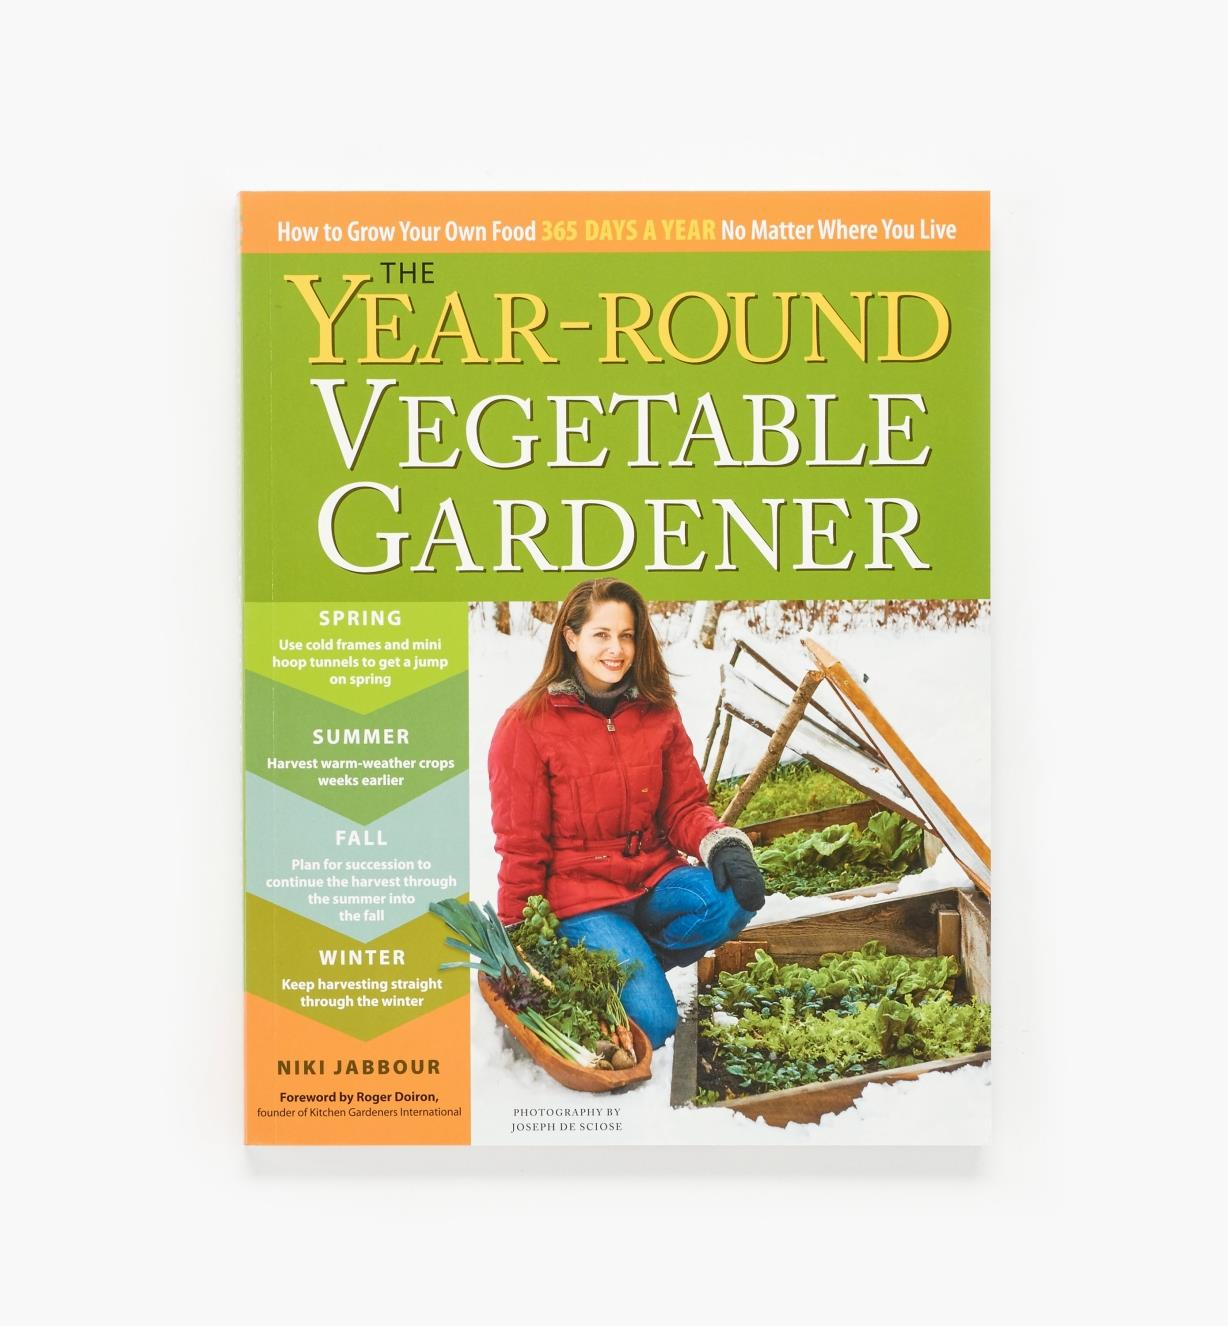 LA928 - The Year-Round Vegetable Gardener